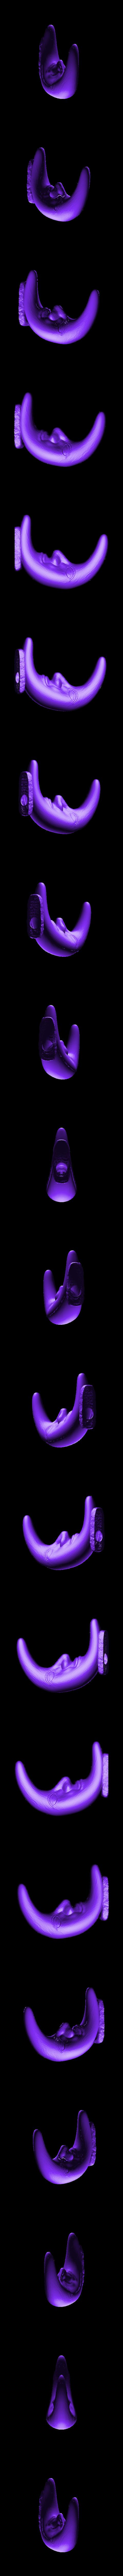 moonlight-1-withhole.stl Download free STL file Moon light by orangeteacher • 3D printable design, orangeteacher